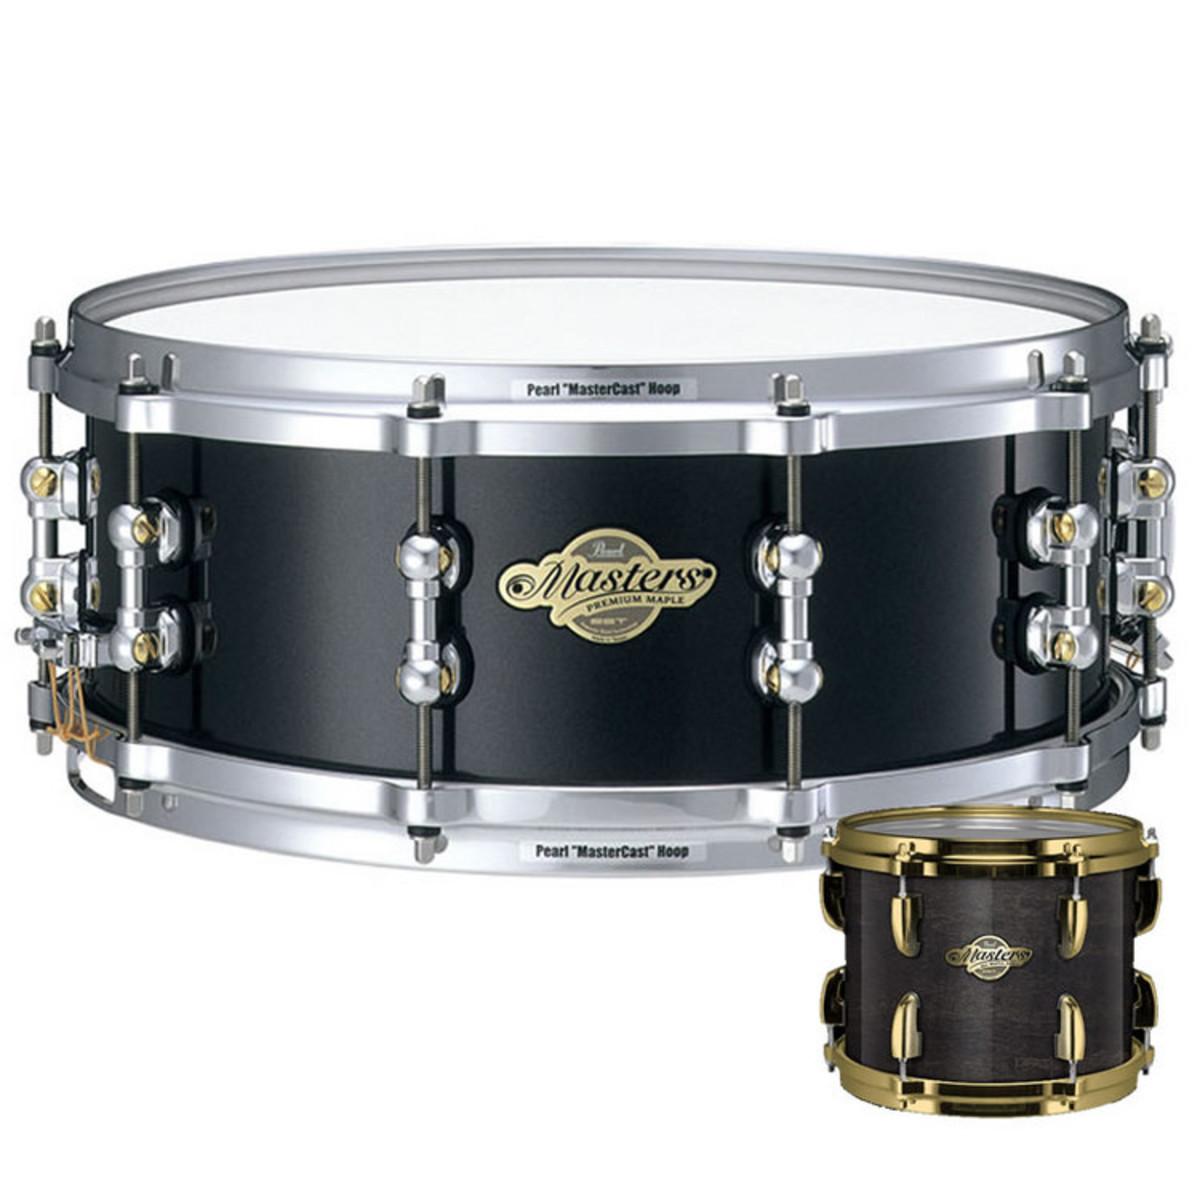 pearl masters premium snare drum 14 x 5 5 black mist at. Black Bedroom Furniture Sets. Home Design Ideas